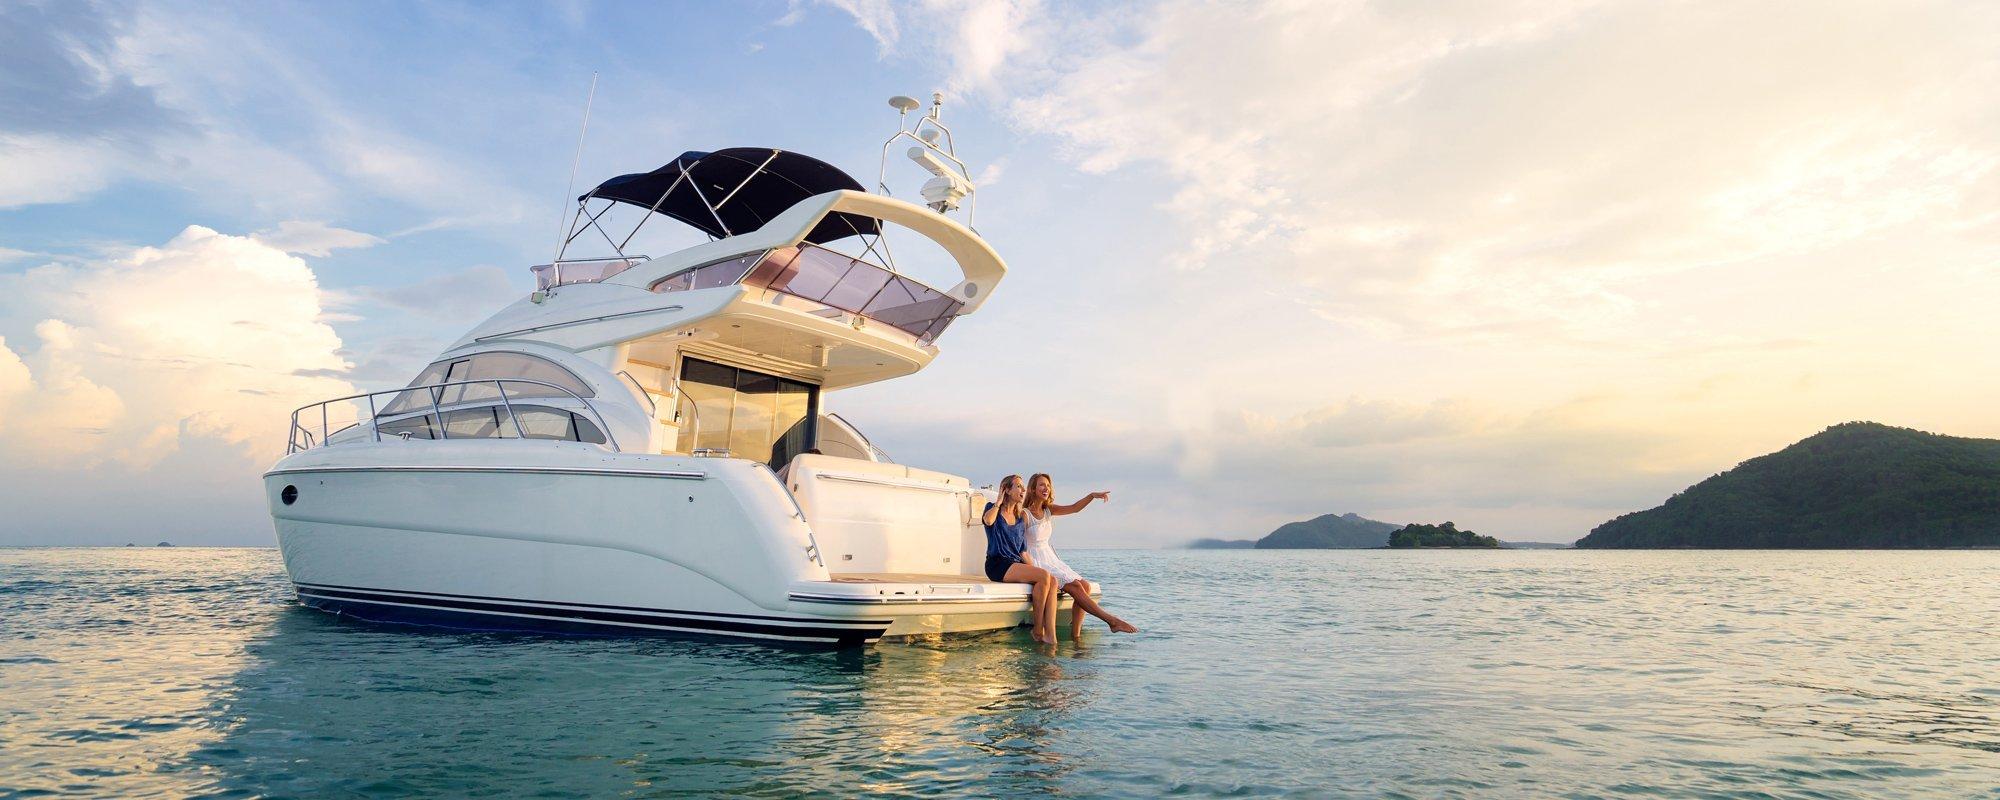 two girls enjoying on boat